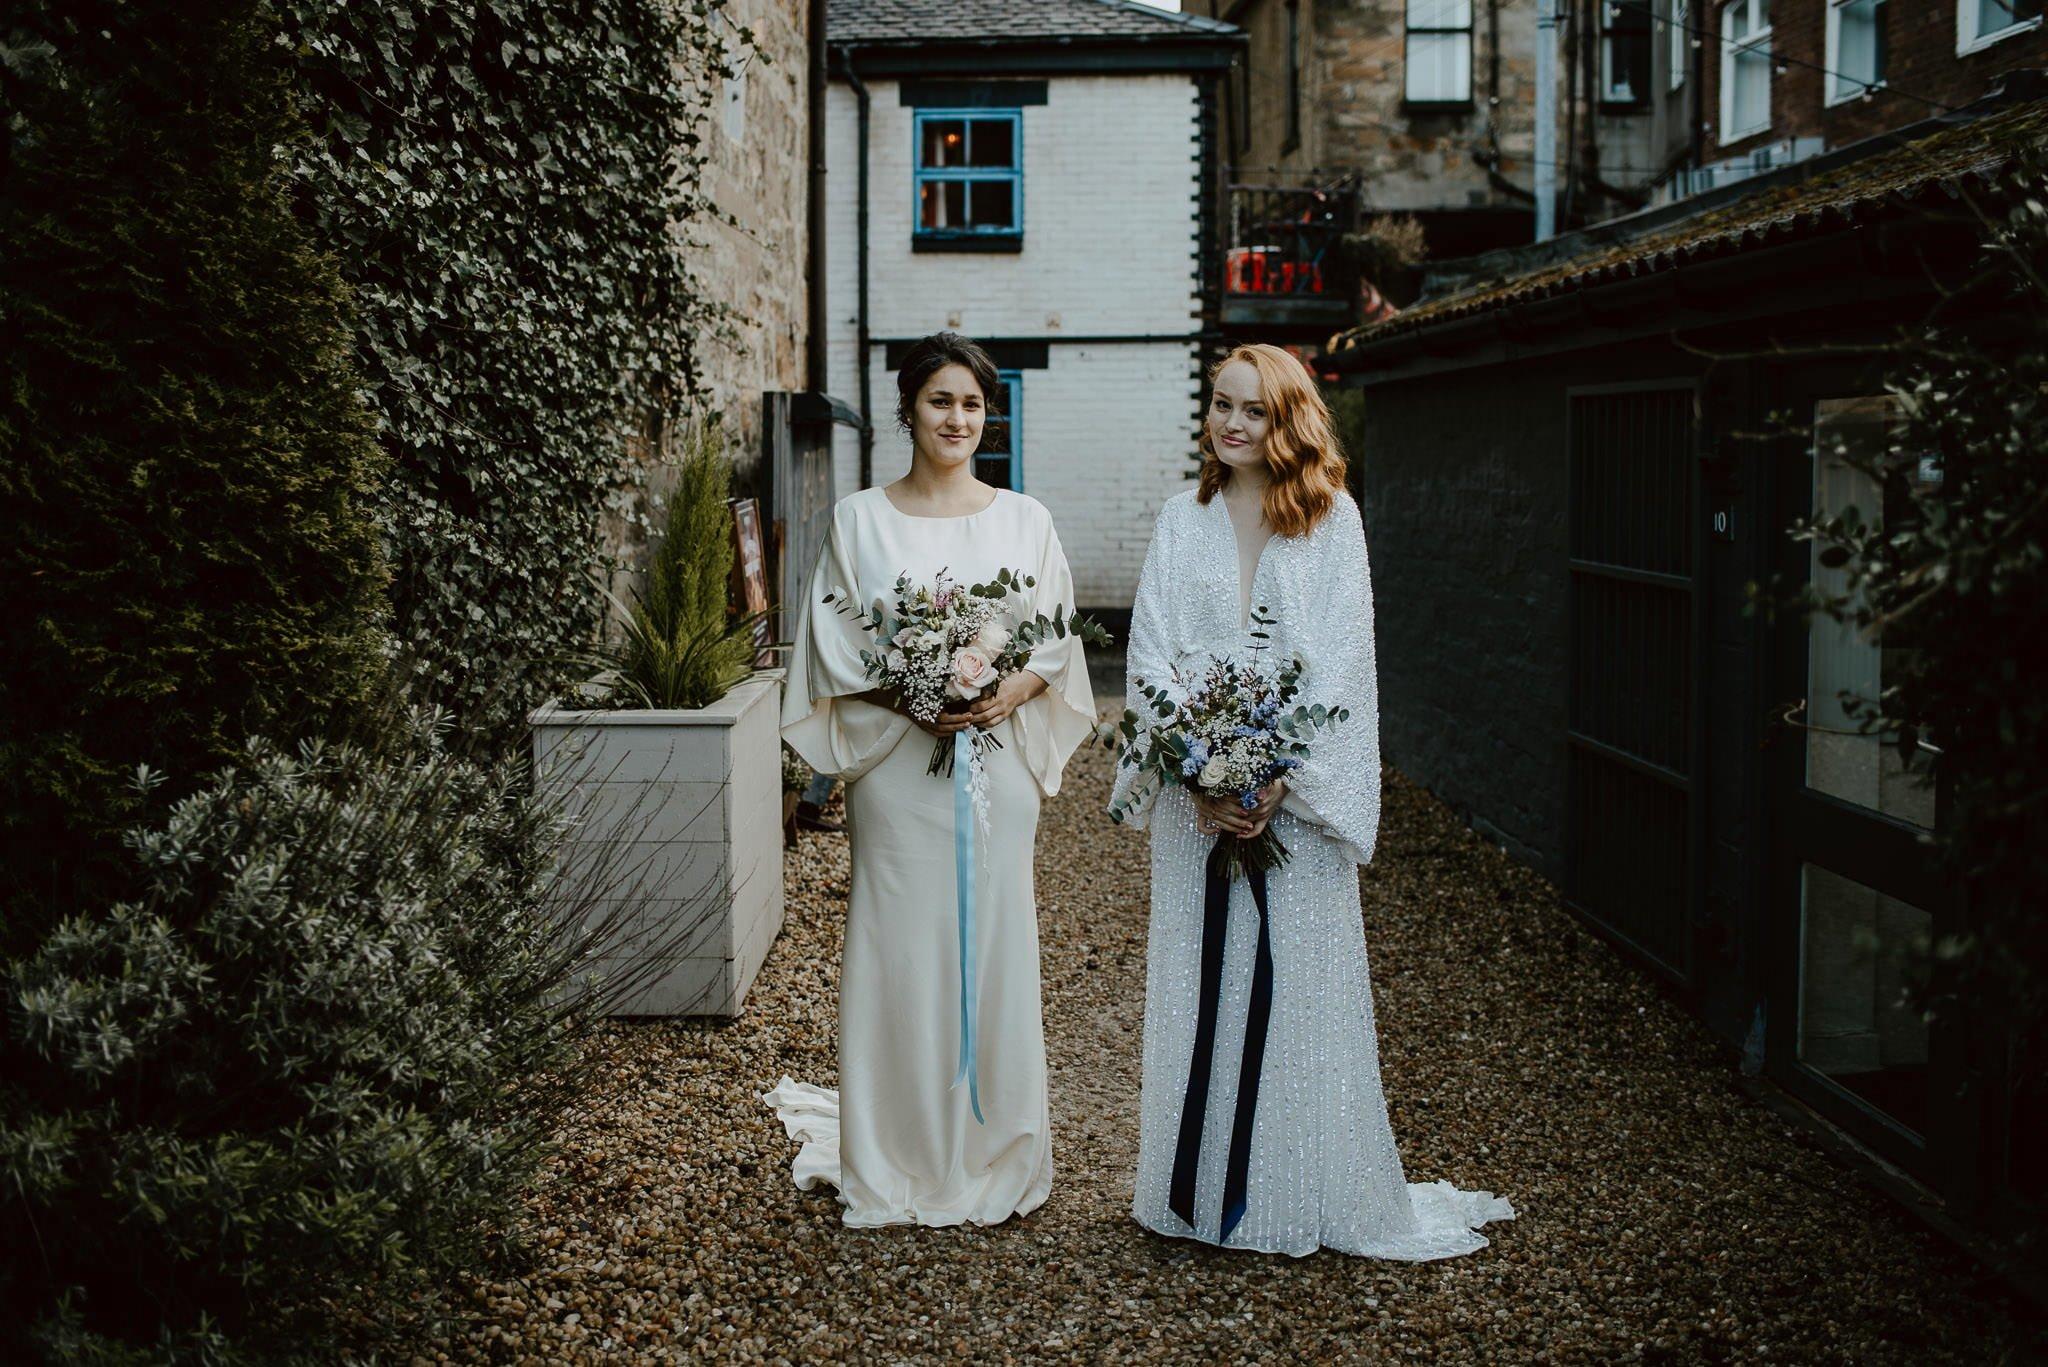 A Dreamy Pre-Raphaelite Wedding at the Bothy in Glasgow 17